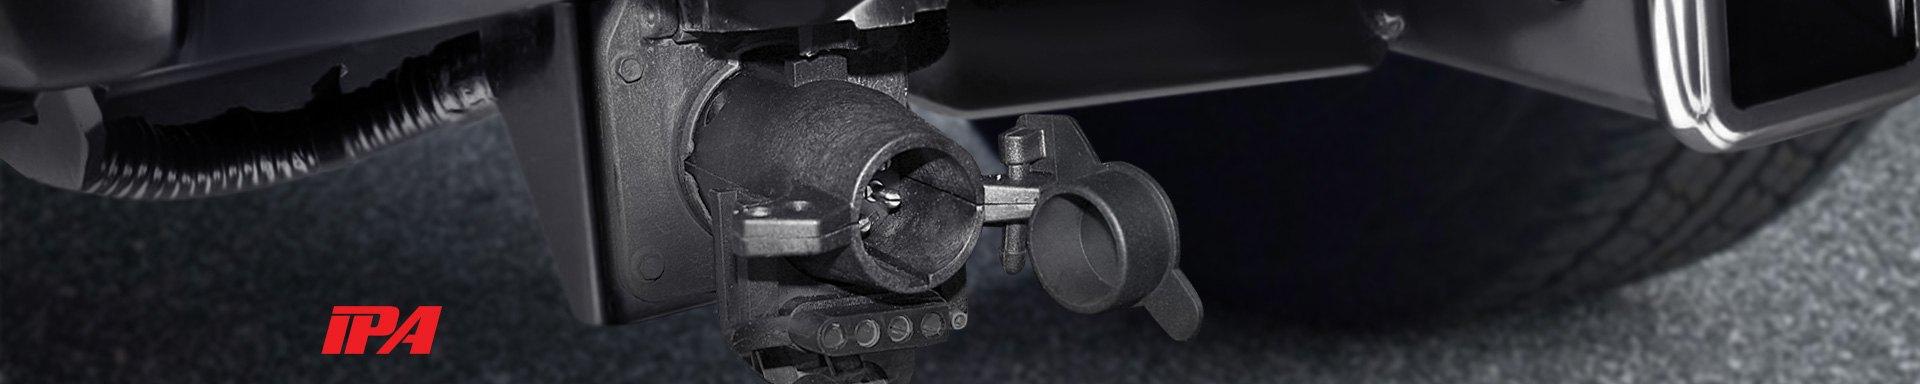 IPA 8029 Automotive Accessories